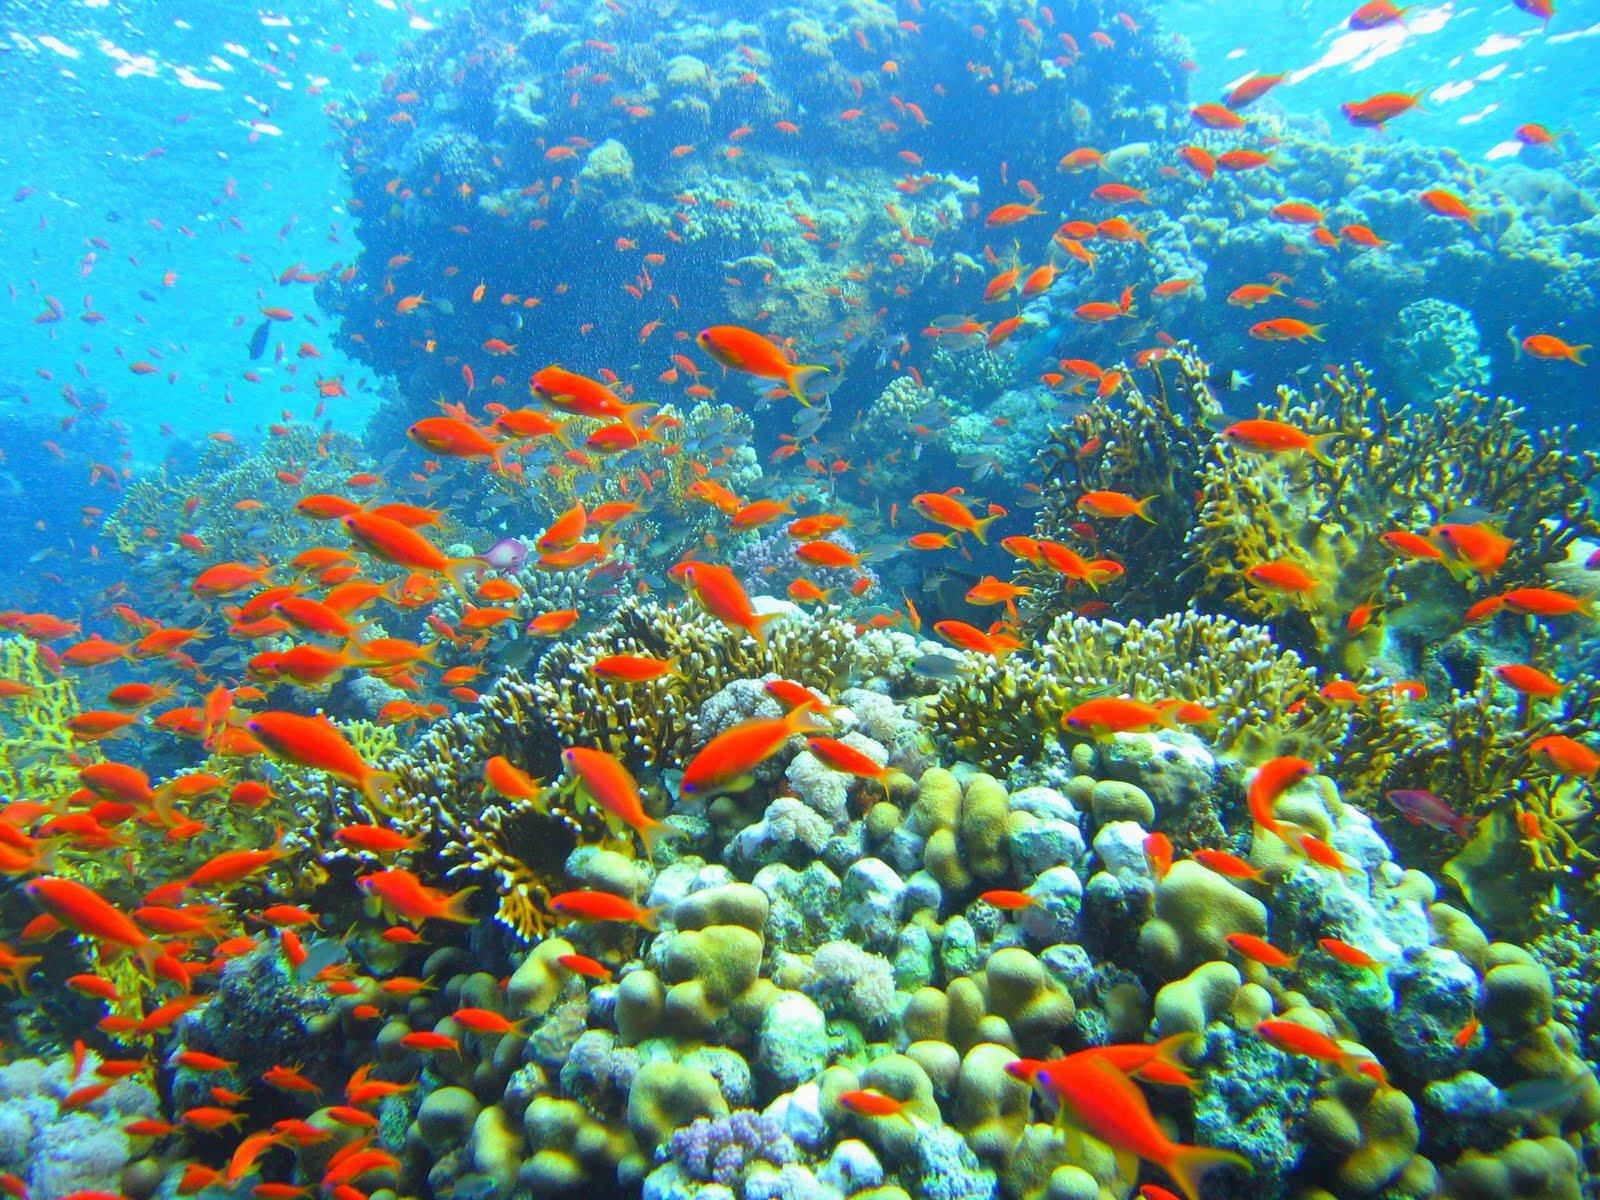 http://2.bp.blogspot.com/--UO5tPyVu-E/TcHk0C9kc_I/AAAAAAAAAIA/ww1ypbZkHp0/s1600/Coral_reef_in_Ras_Muhammad_nature_park_%2528Iolanda_reef%2529.jpg